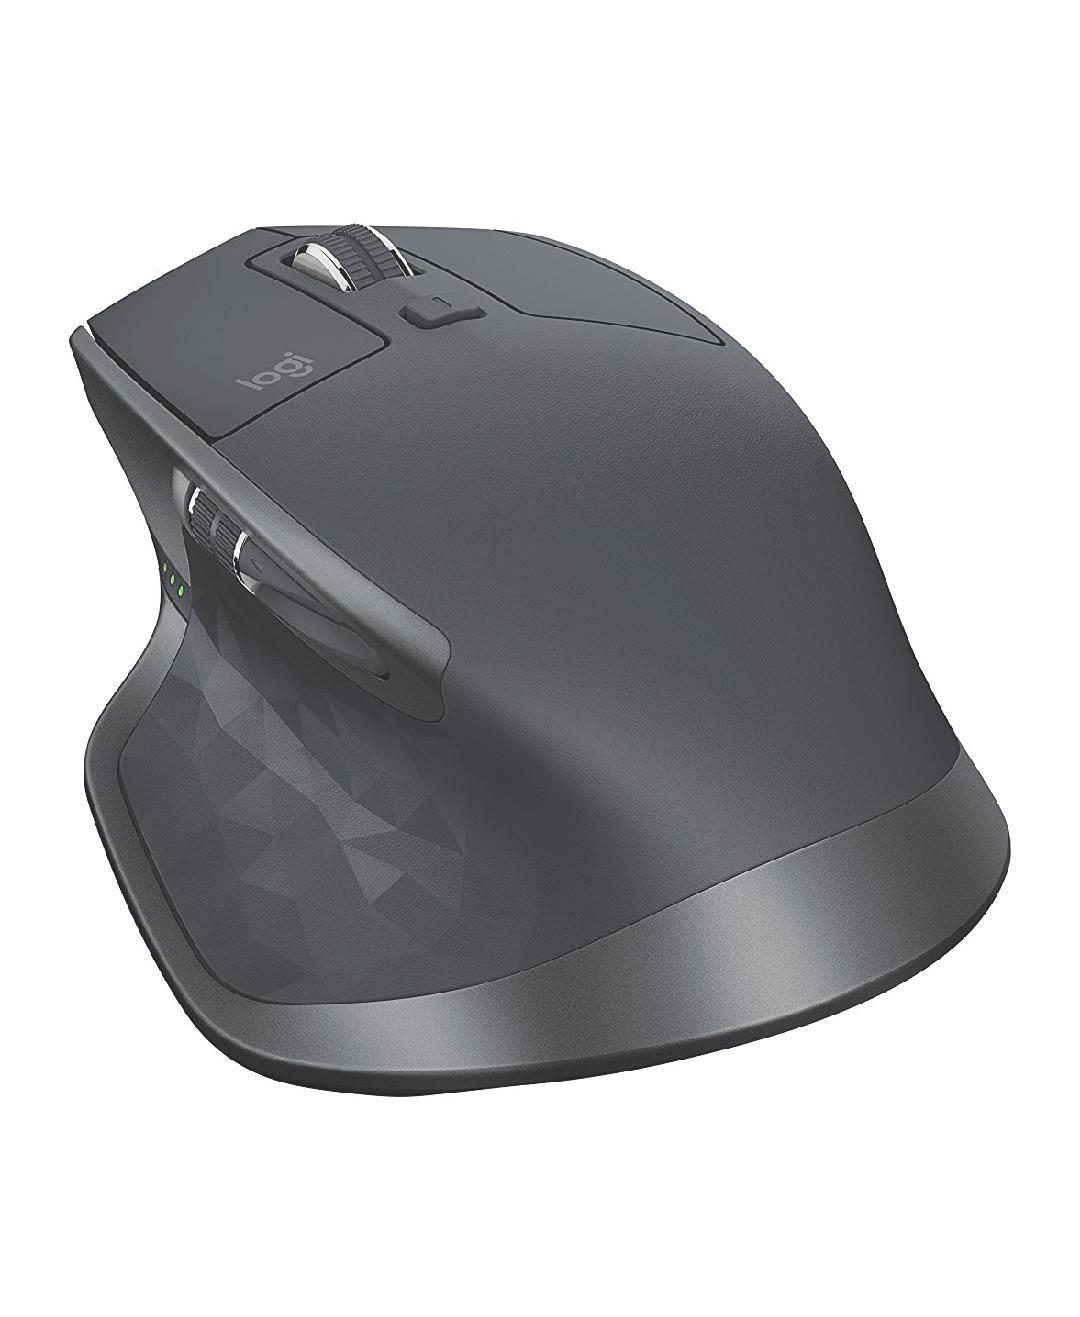 Logitech Mouse M331 Silent Plus Singapore Wireless Mx Master 2s